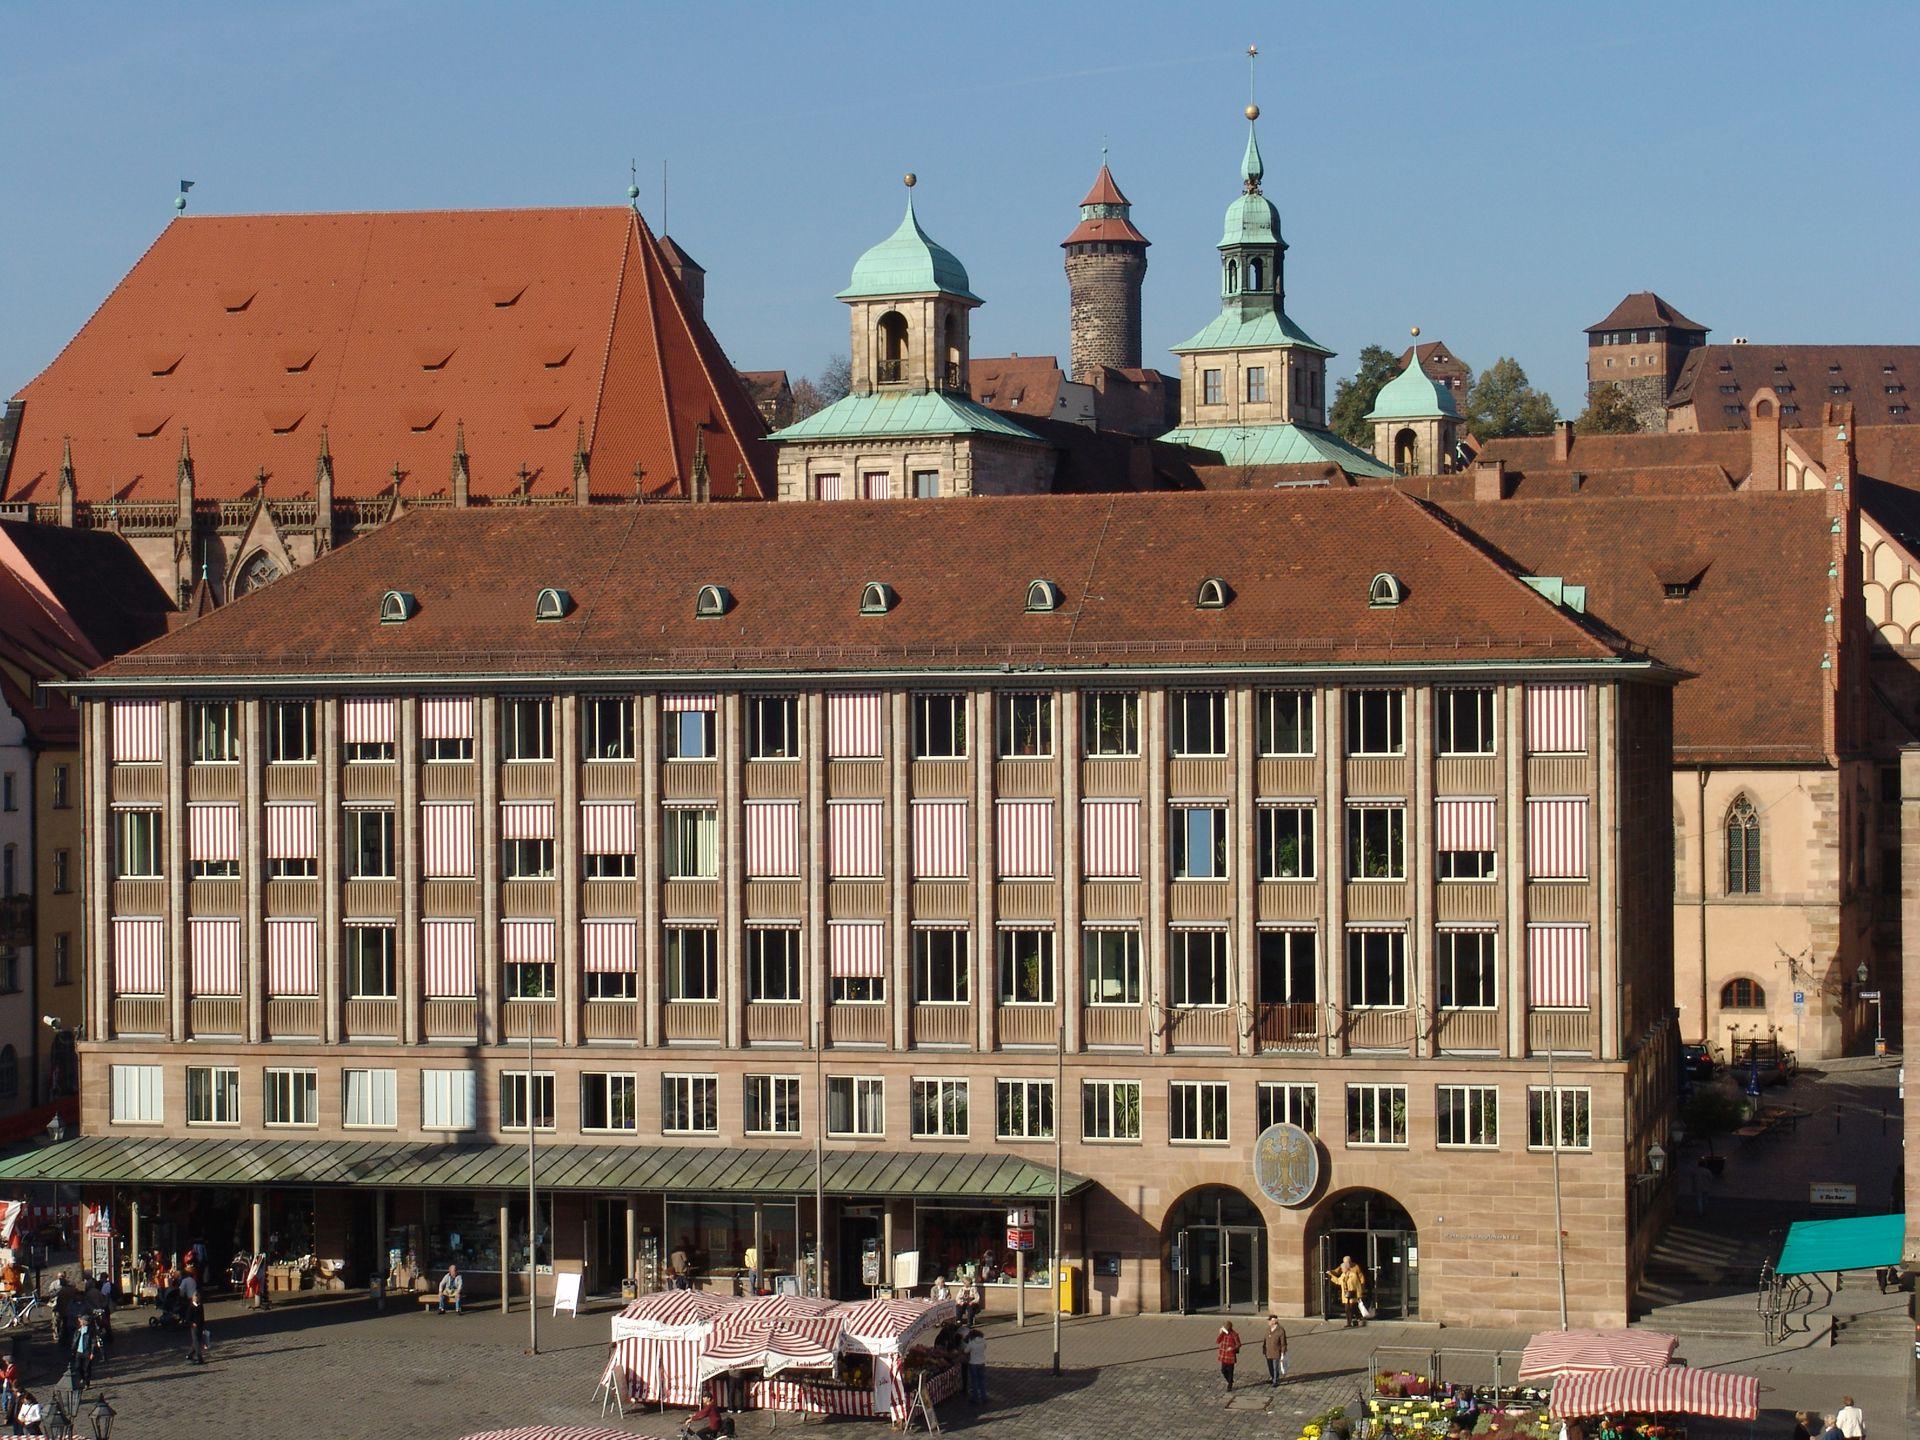 New City Hall at Hauptmarkt (Main Market) South front